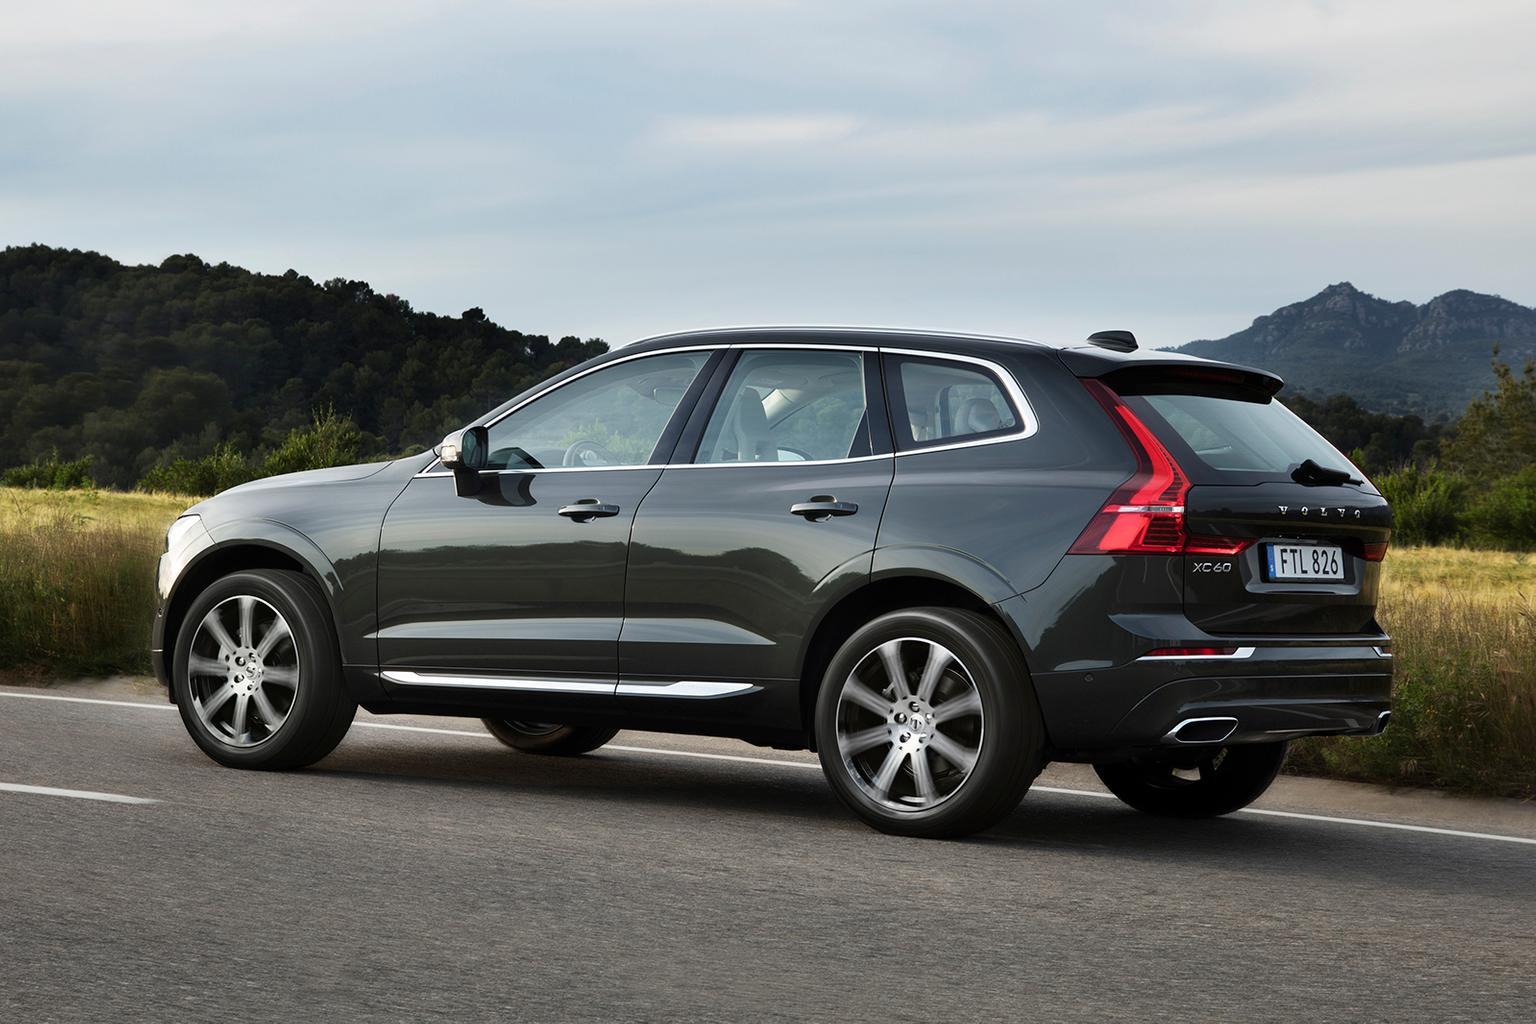 Volvo XC60 review 2017